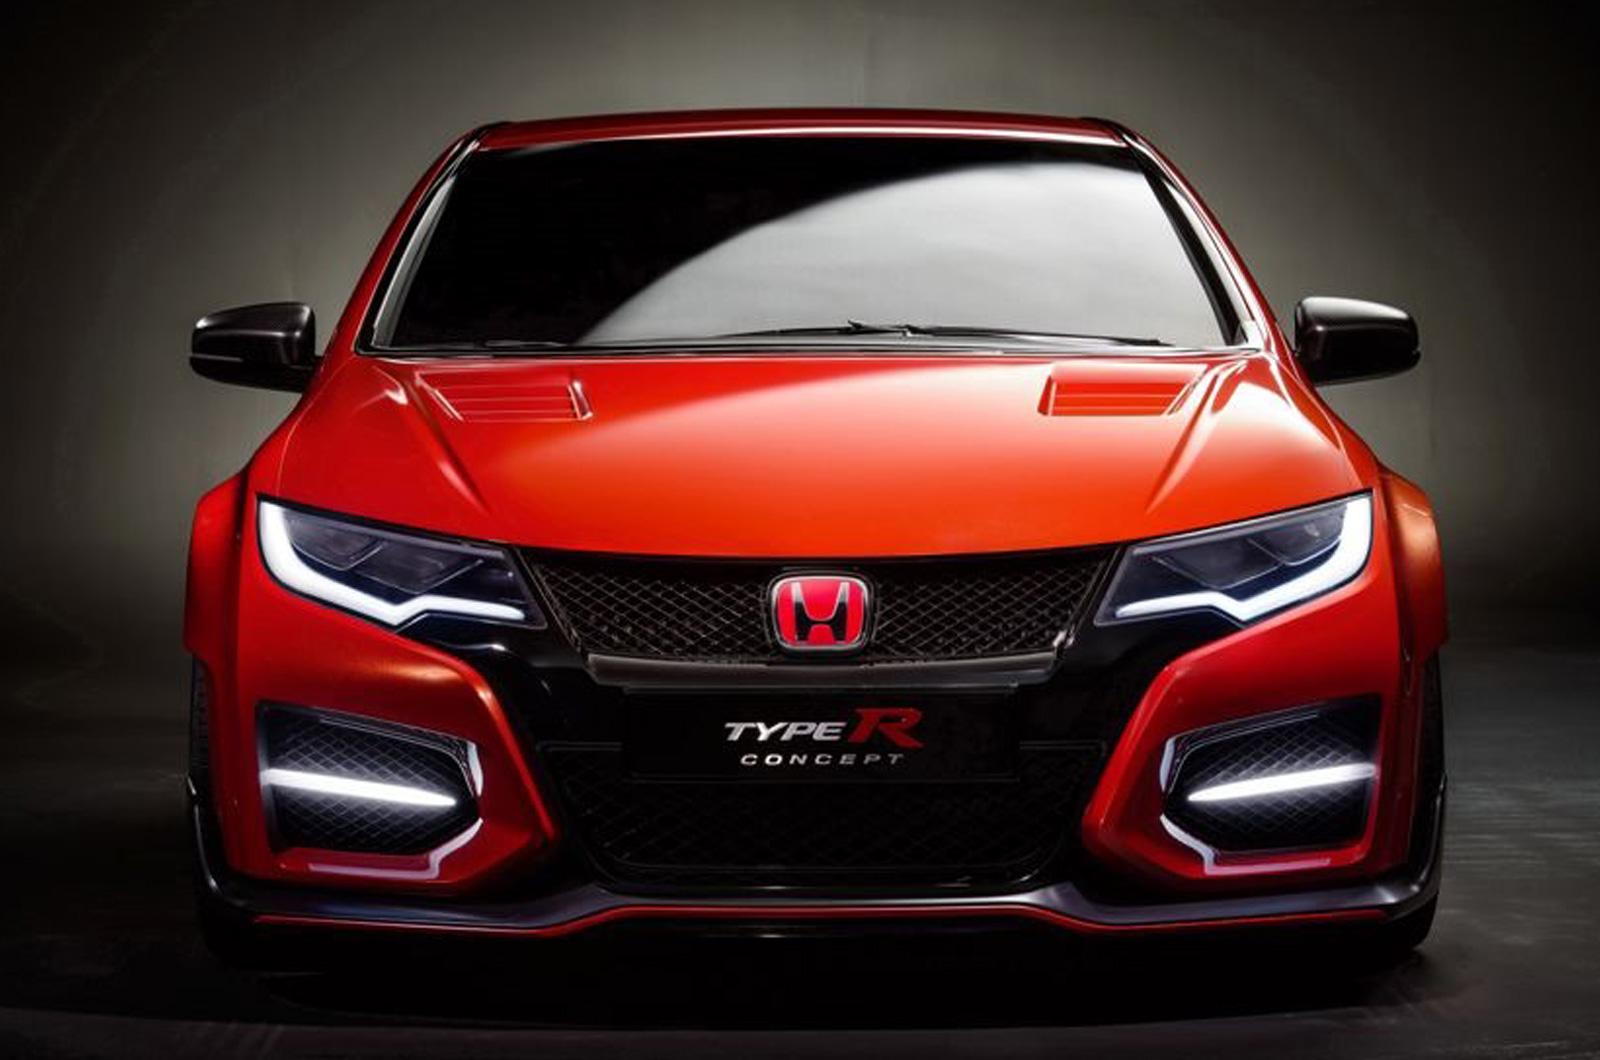 Honda Civic Type R Concept Leaks Before Geneva Debut - GTspirit